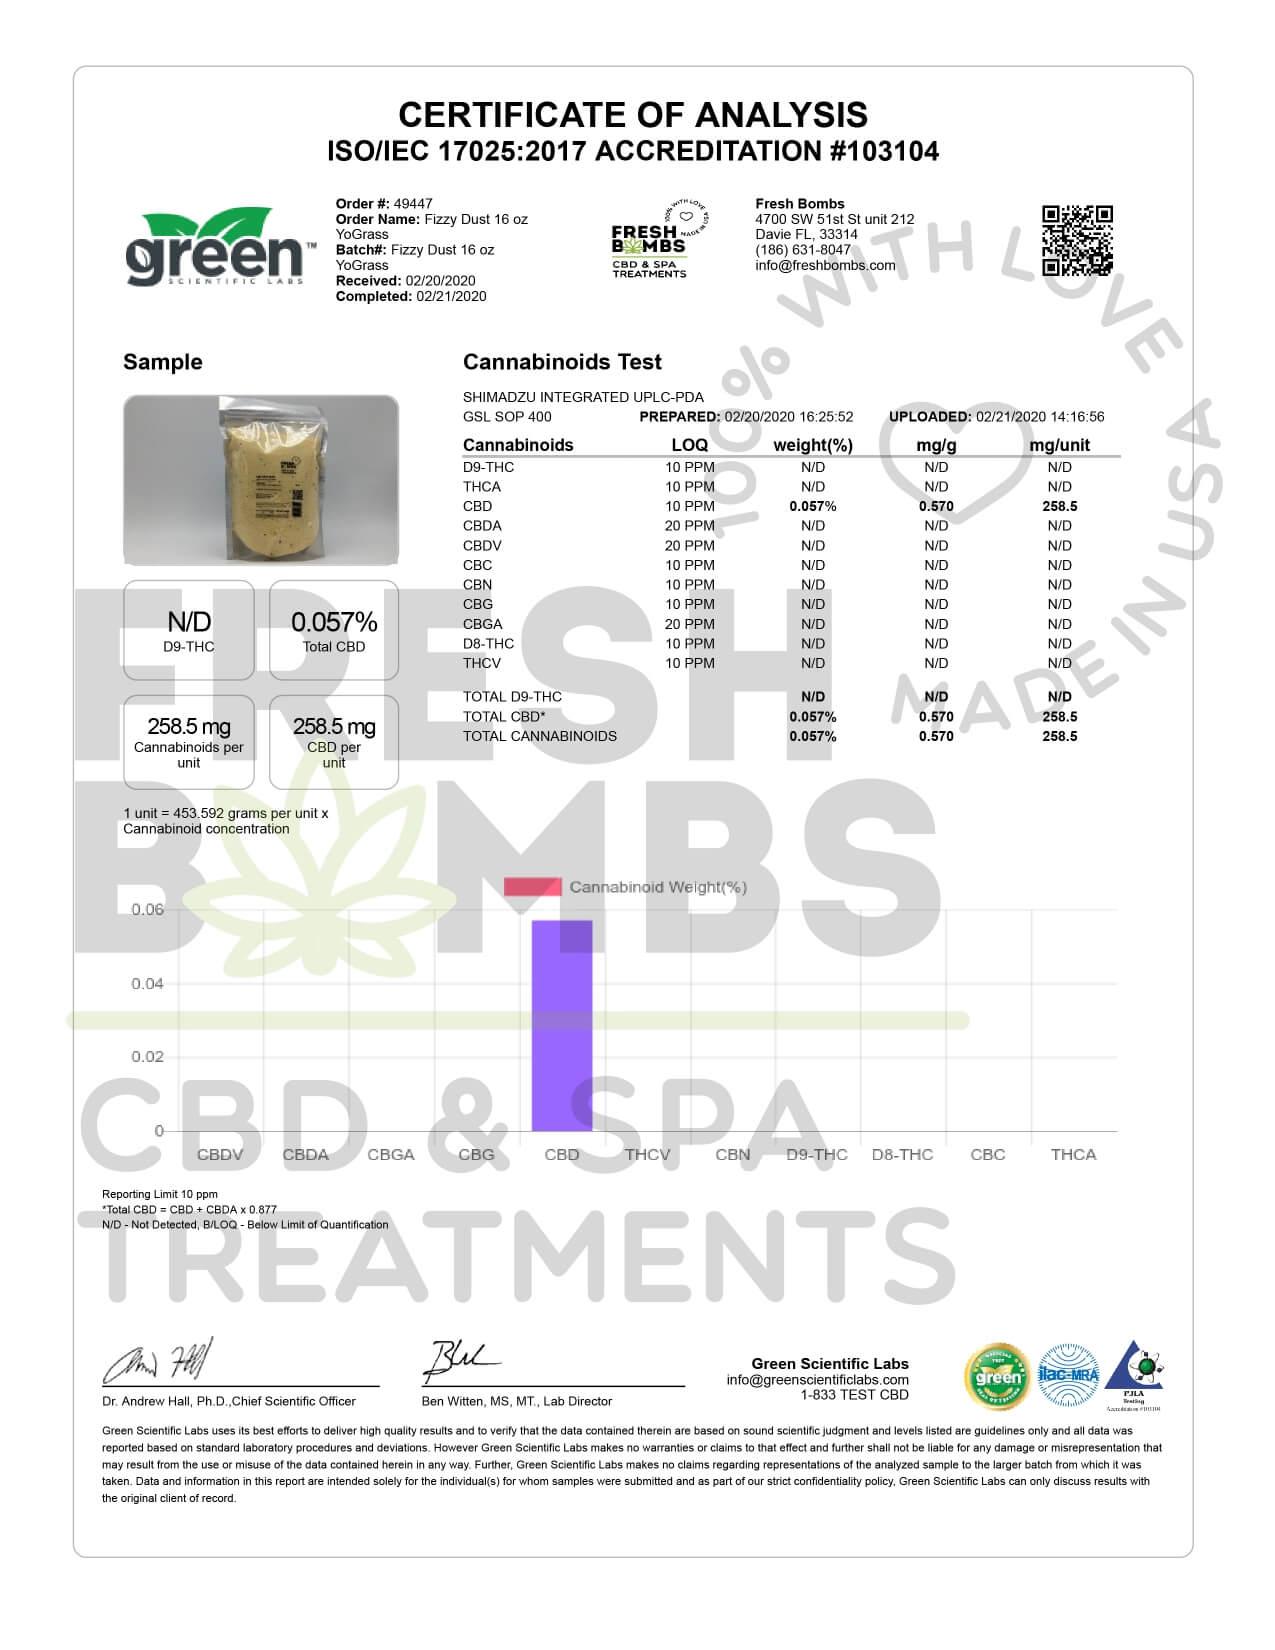 Fresh Bombs CBD Bath YoGrass Fizzy Dust 250mg Lab Report